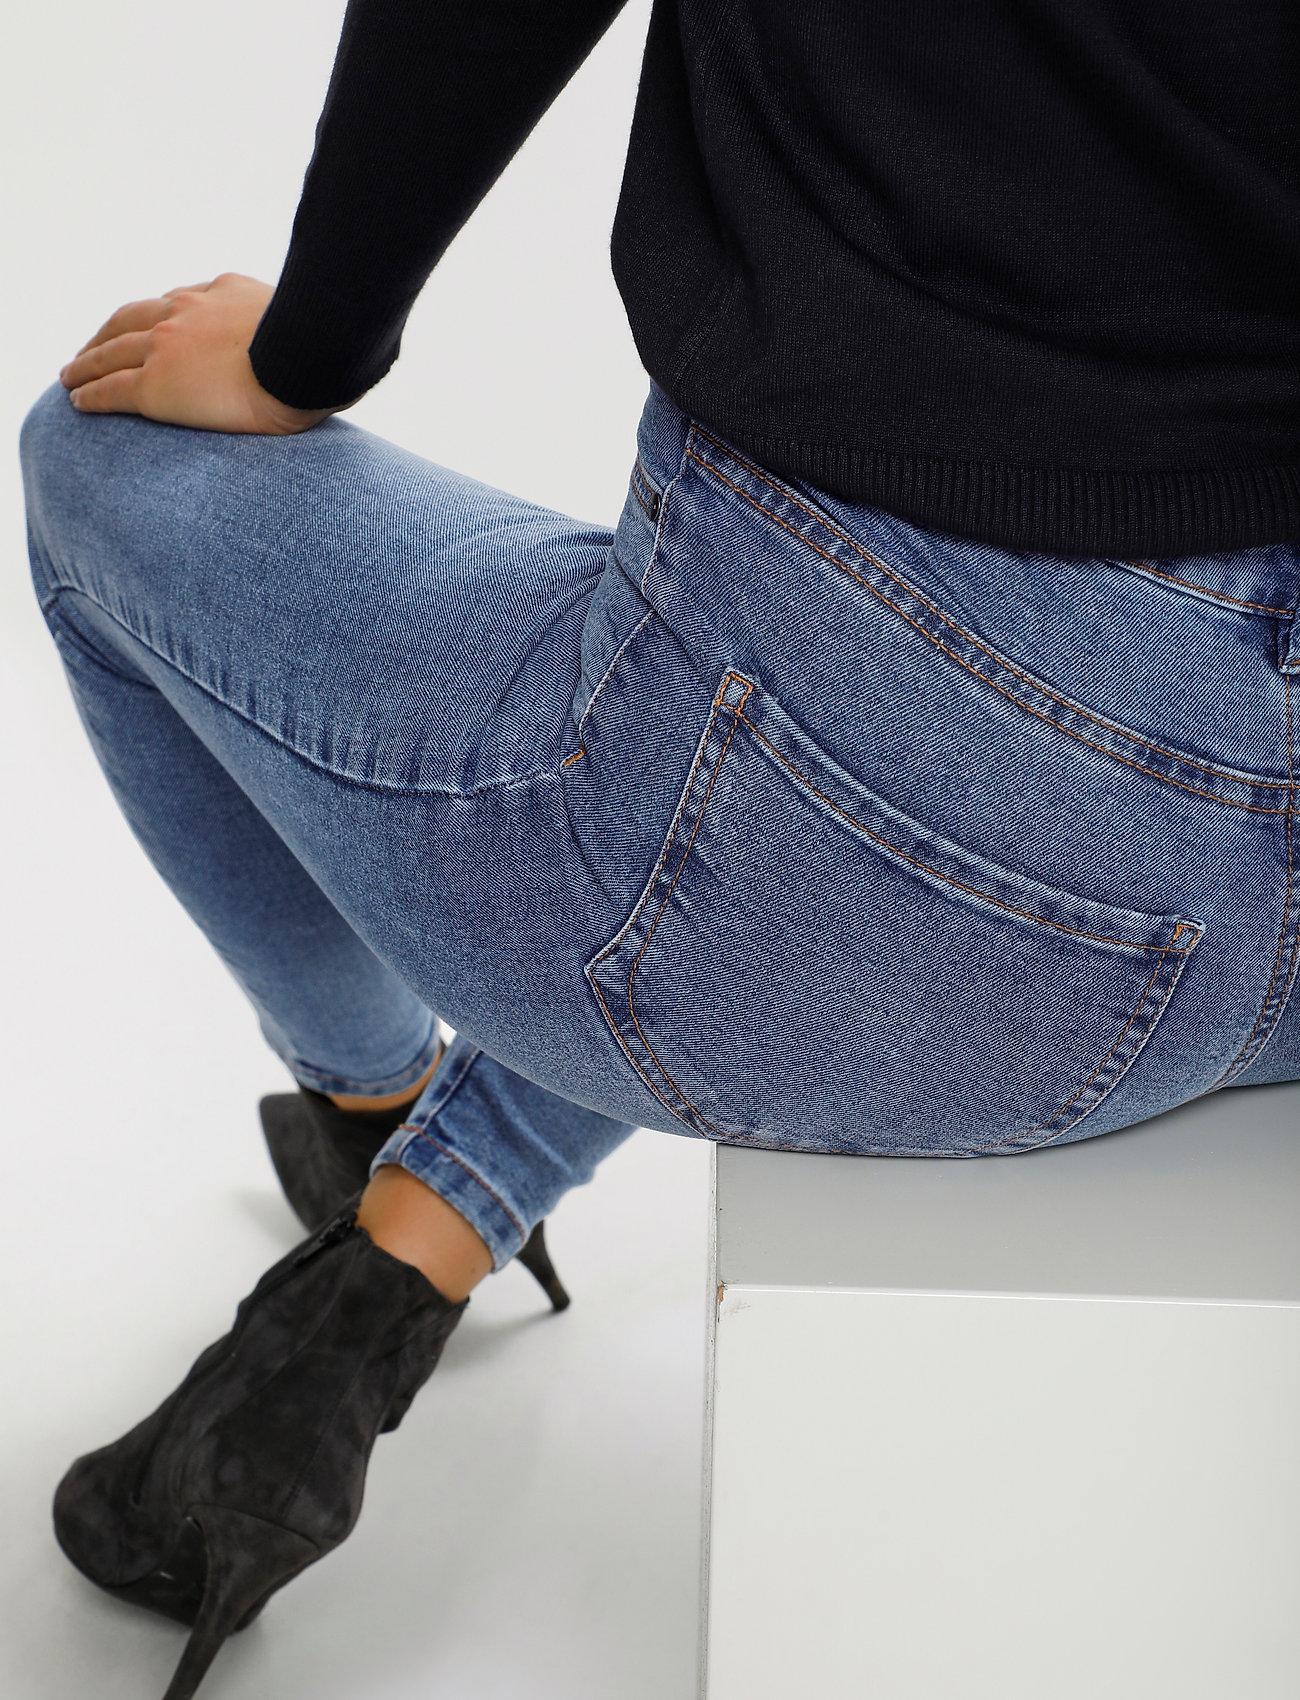 Saint Tropez - T5757, TinnaSZ Jeans - skinny jeans - light blue denim - 6